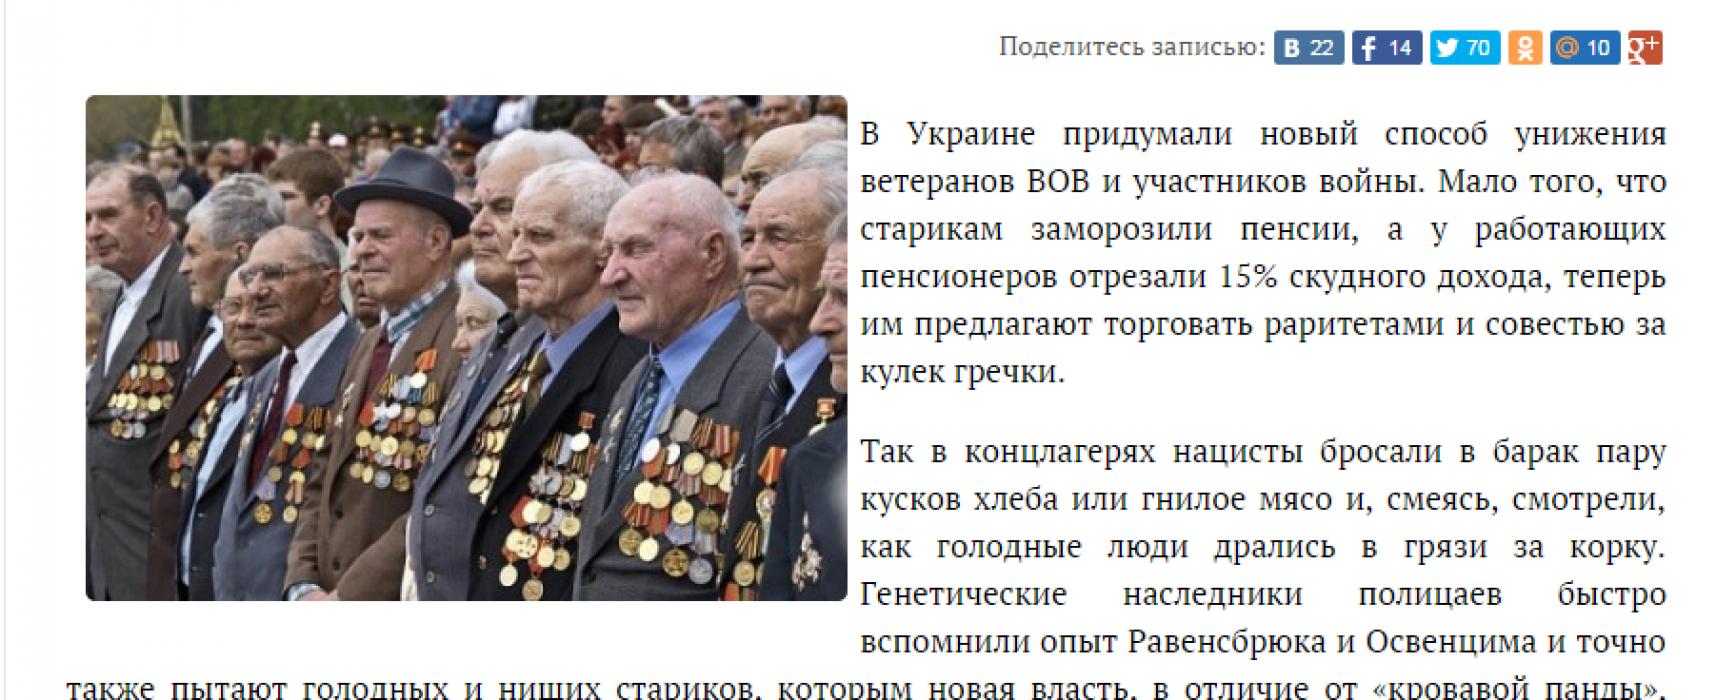 Fake: Veterans Exchange Medals for Food in Chernigiv